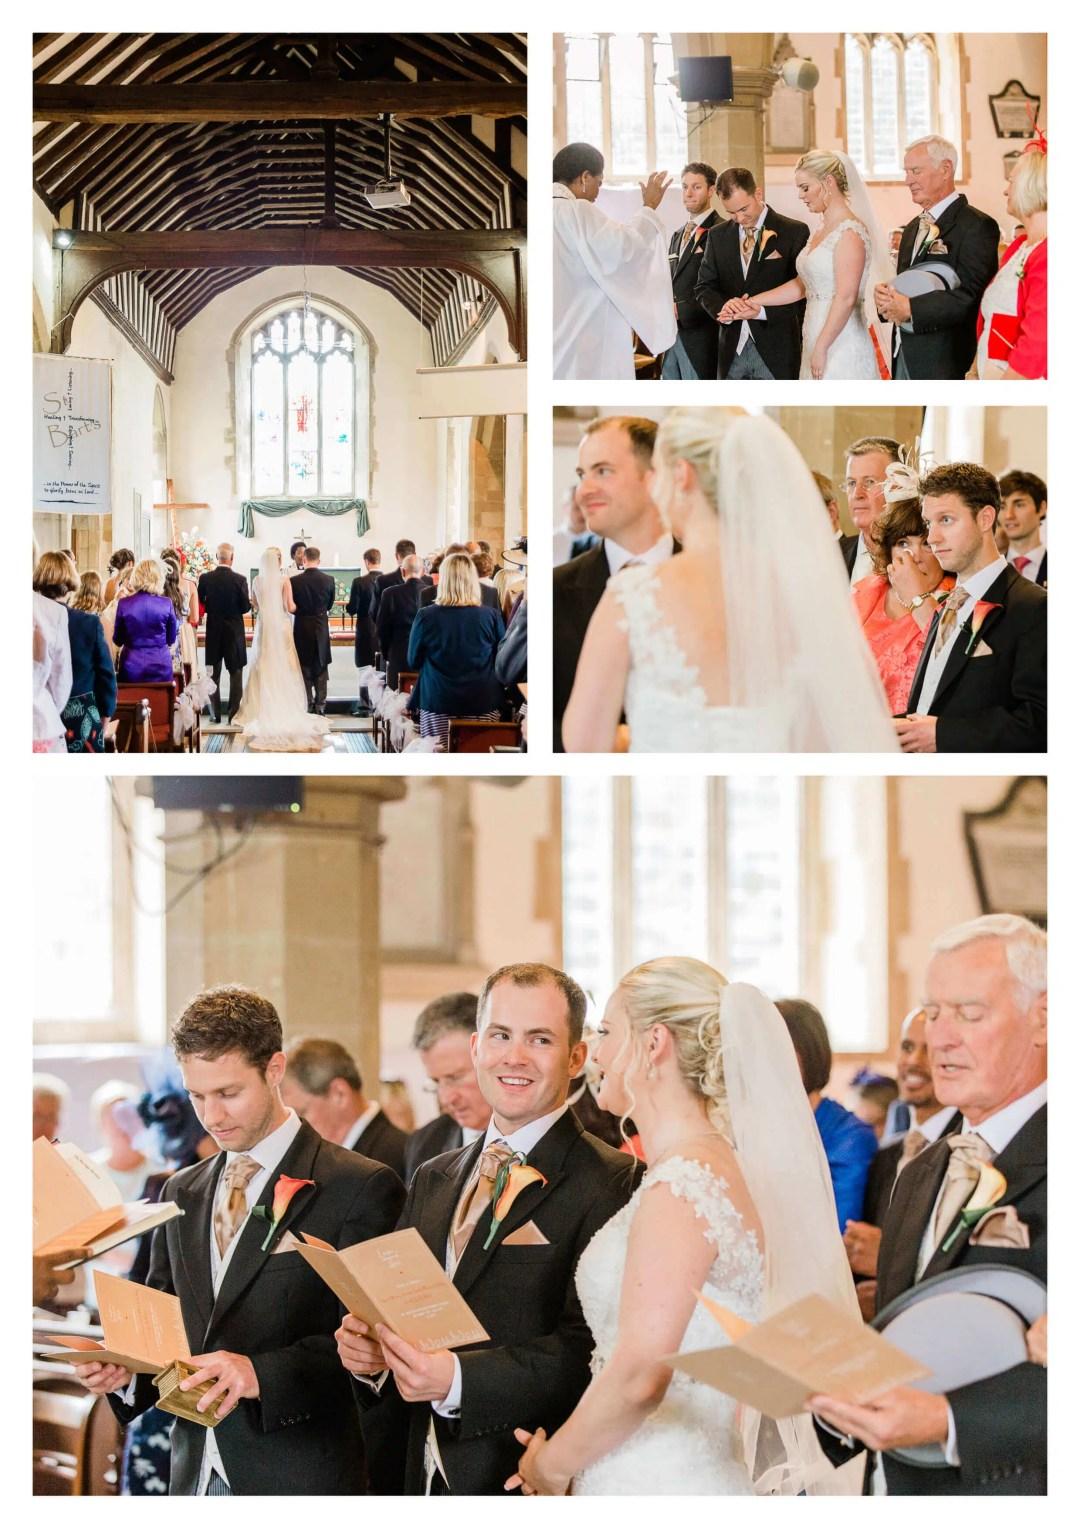 St Bartholomew's Church wedding ceremony in Horley   Surrey Photographer